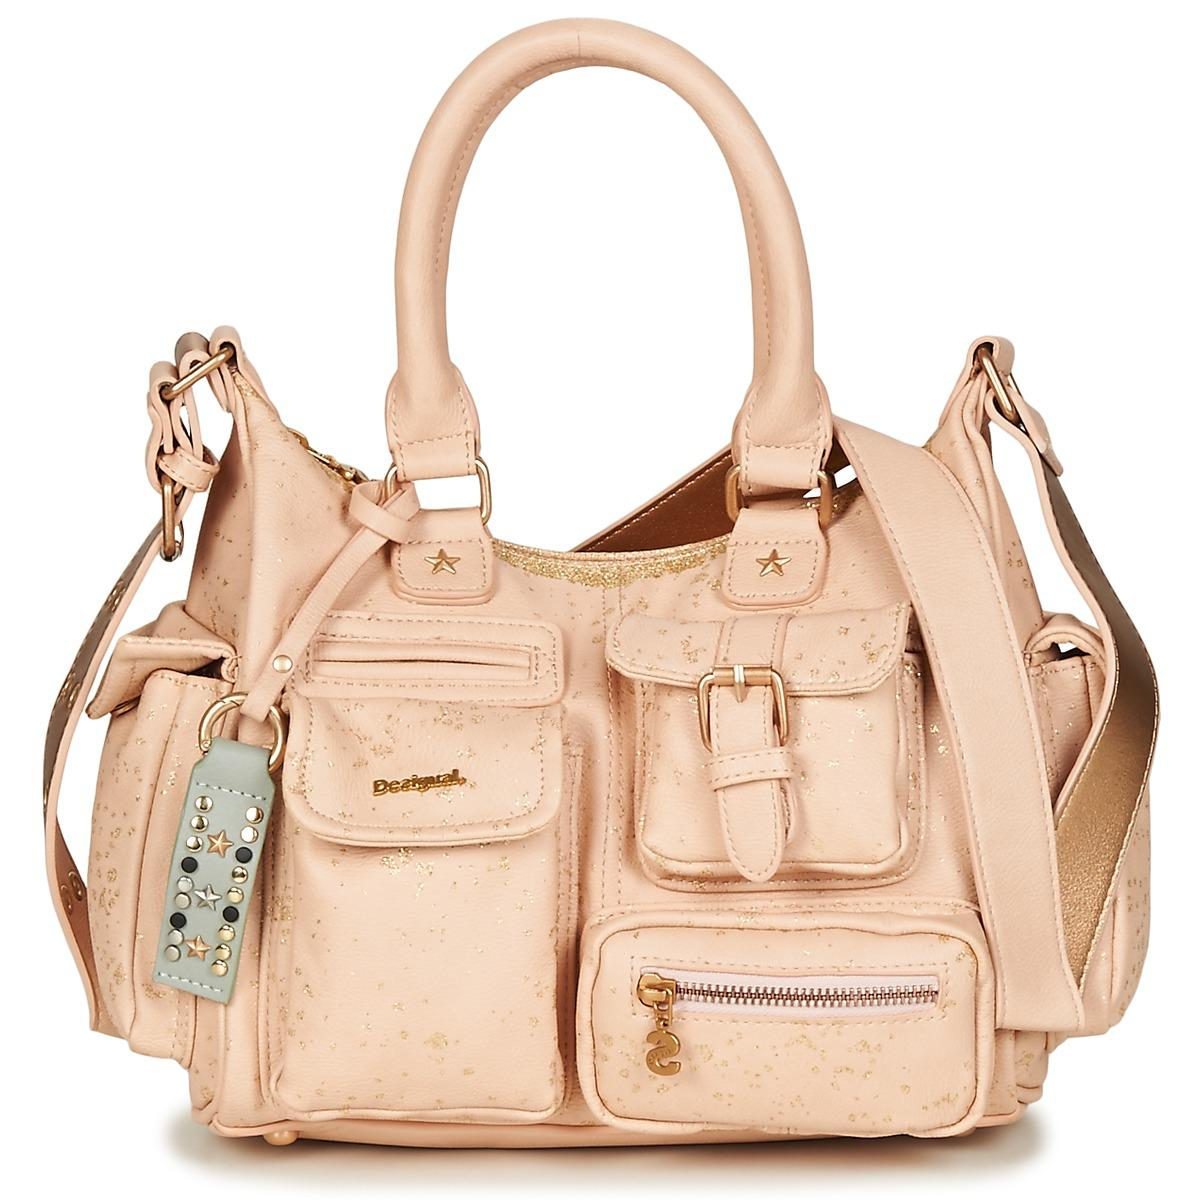 01edc9ba378 Desigual Metallic Splatter London Shoulder Bag in Pink - Lyst